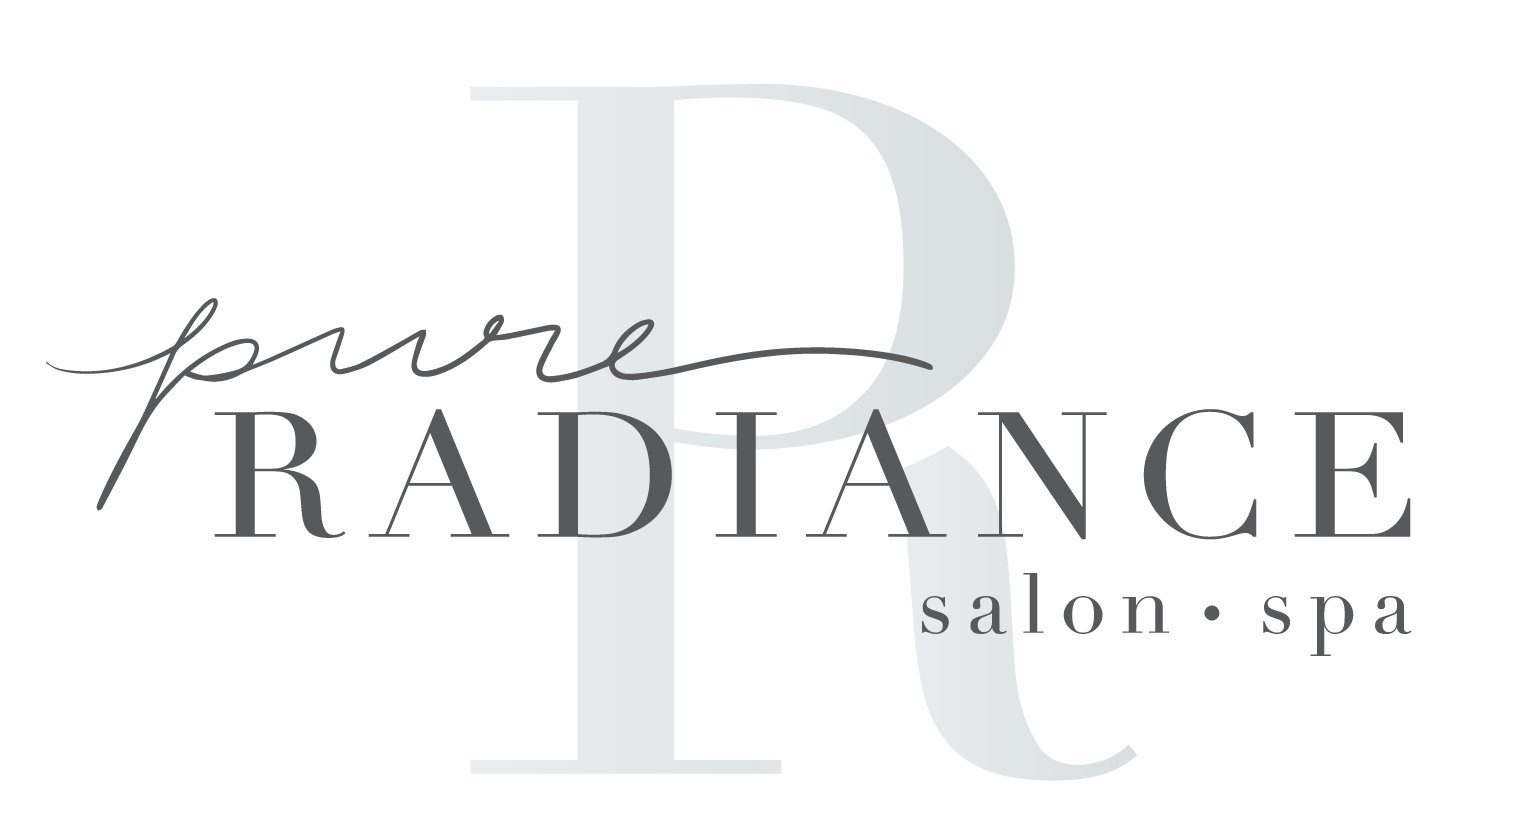 Pure Radiance Salon & Spa | Lawrenceburg, KY